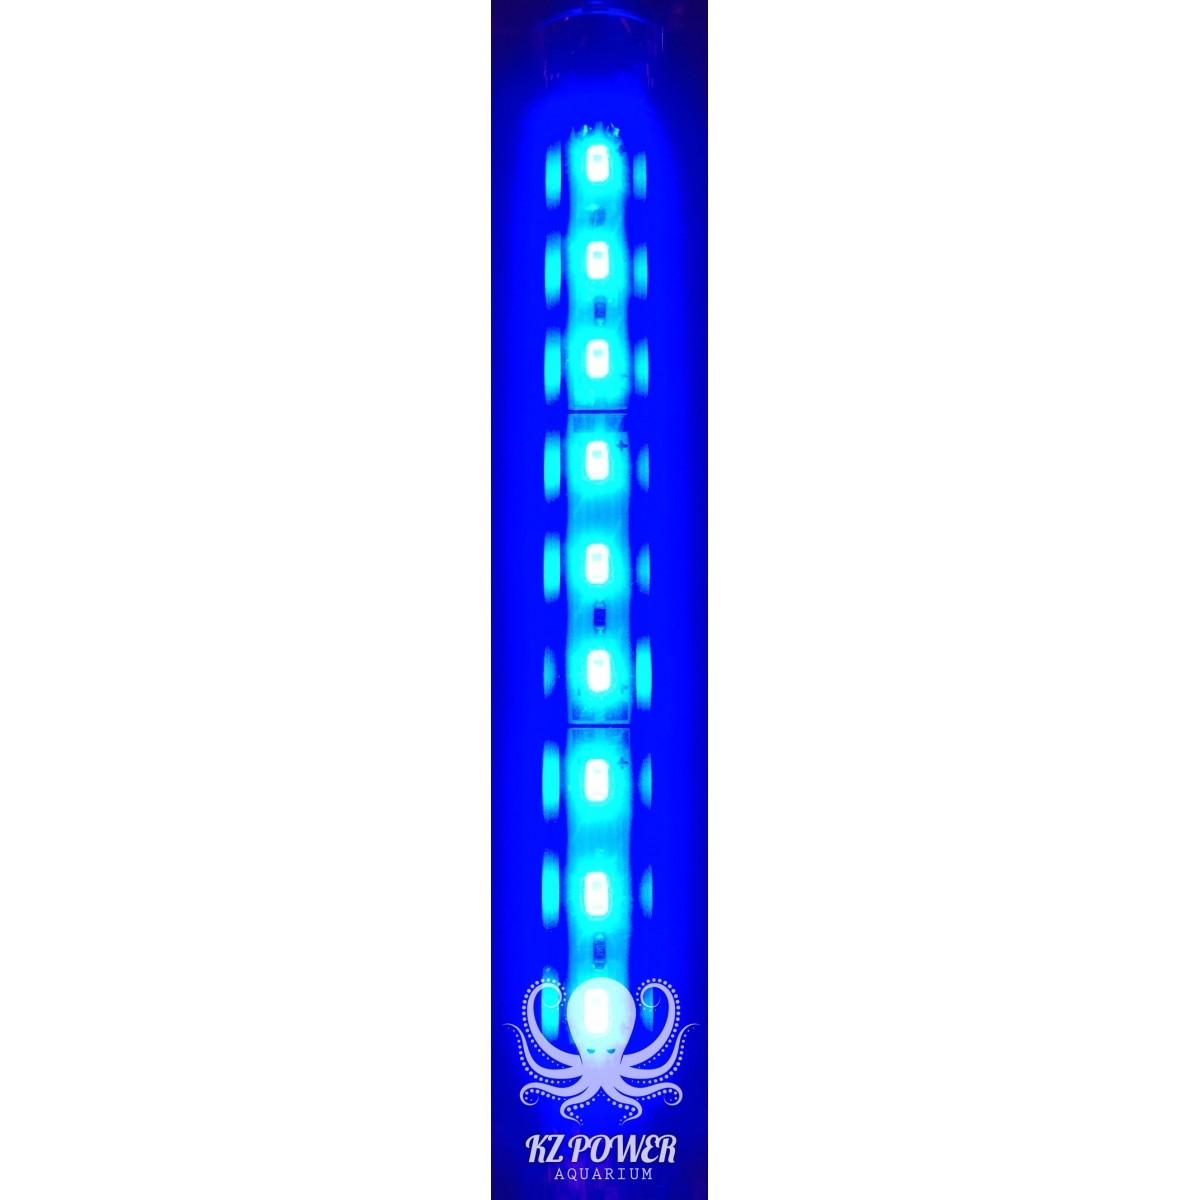 Luminaria Led Aqualumi Azul 95cm + Fonte Bivolt  - KZ Power